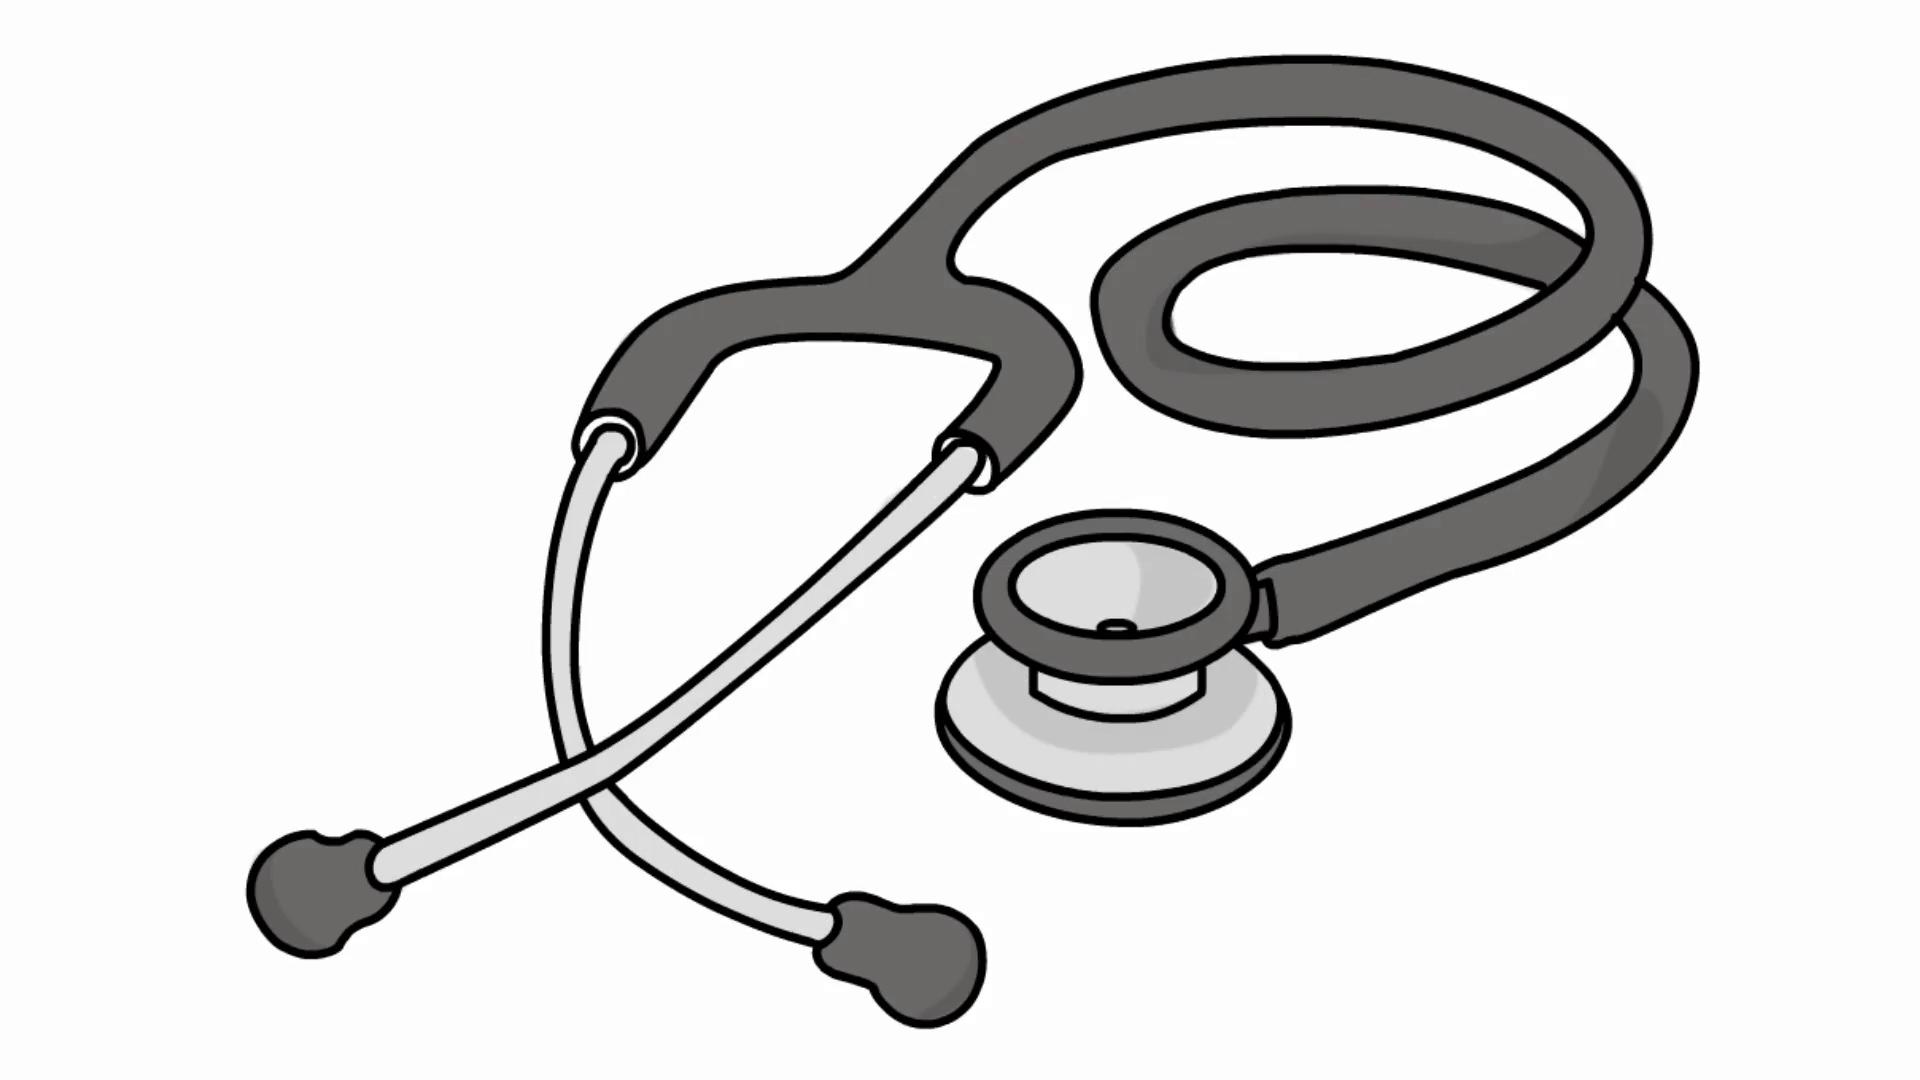 cardiology stethoscope medical sketch illustration hand drawn ...